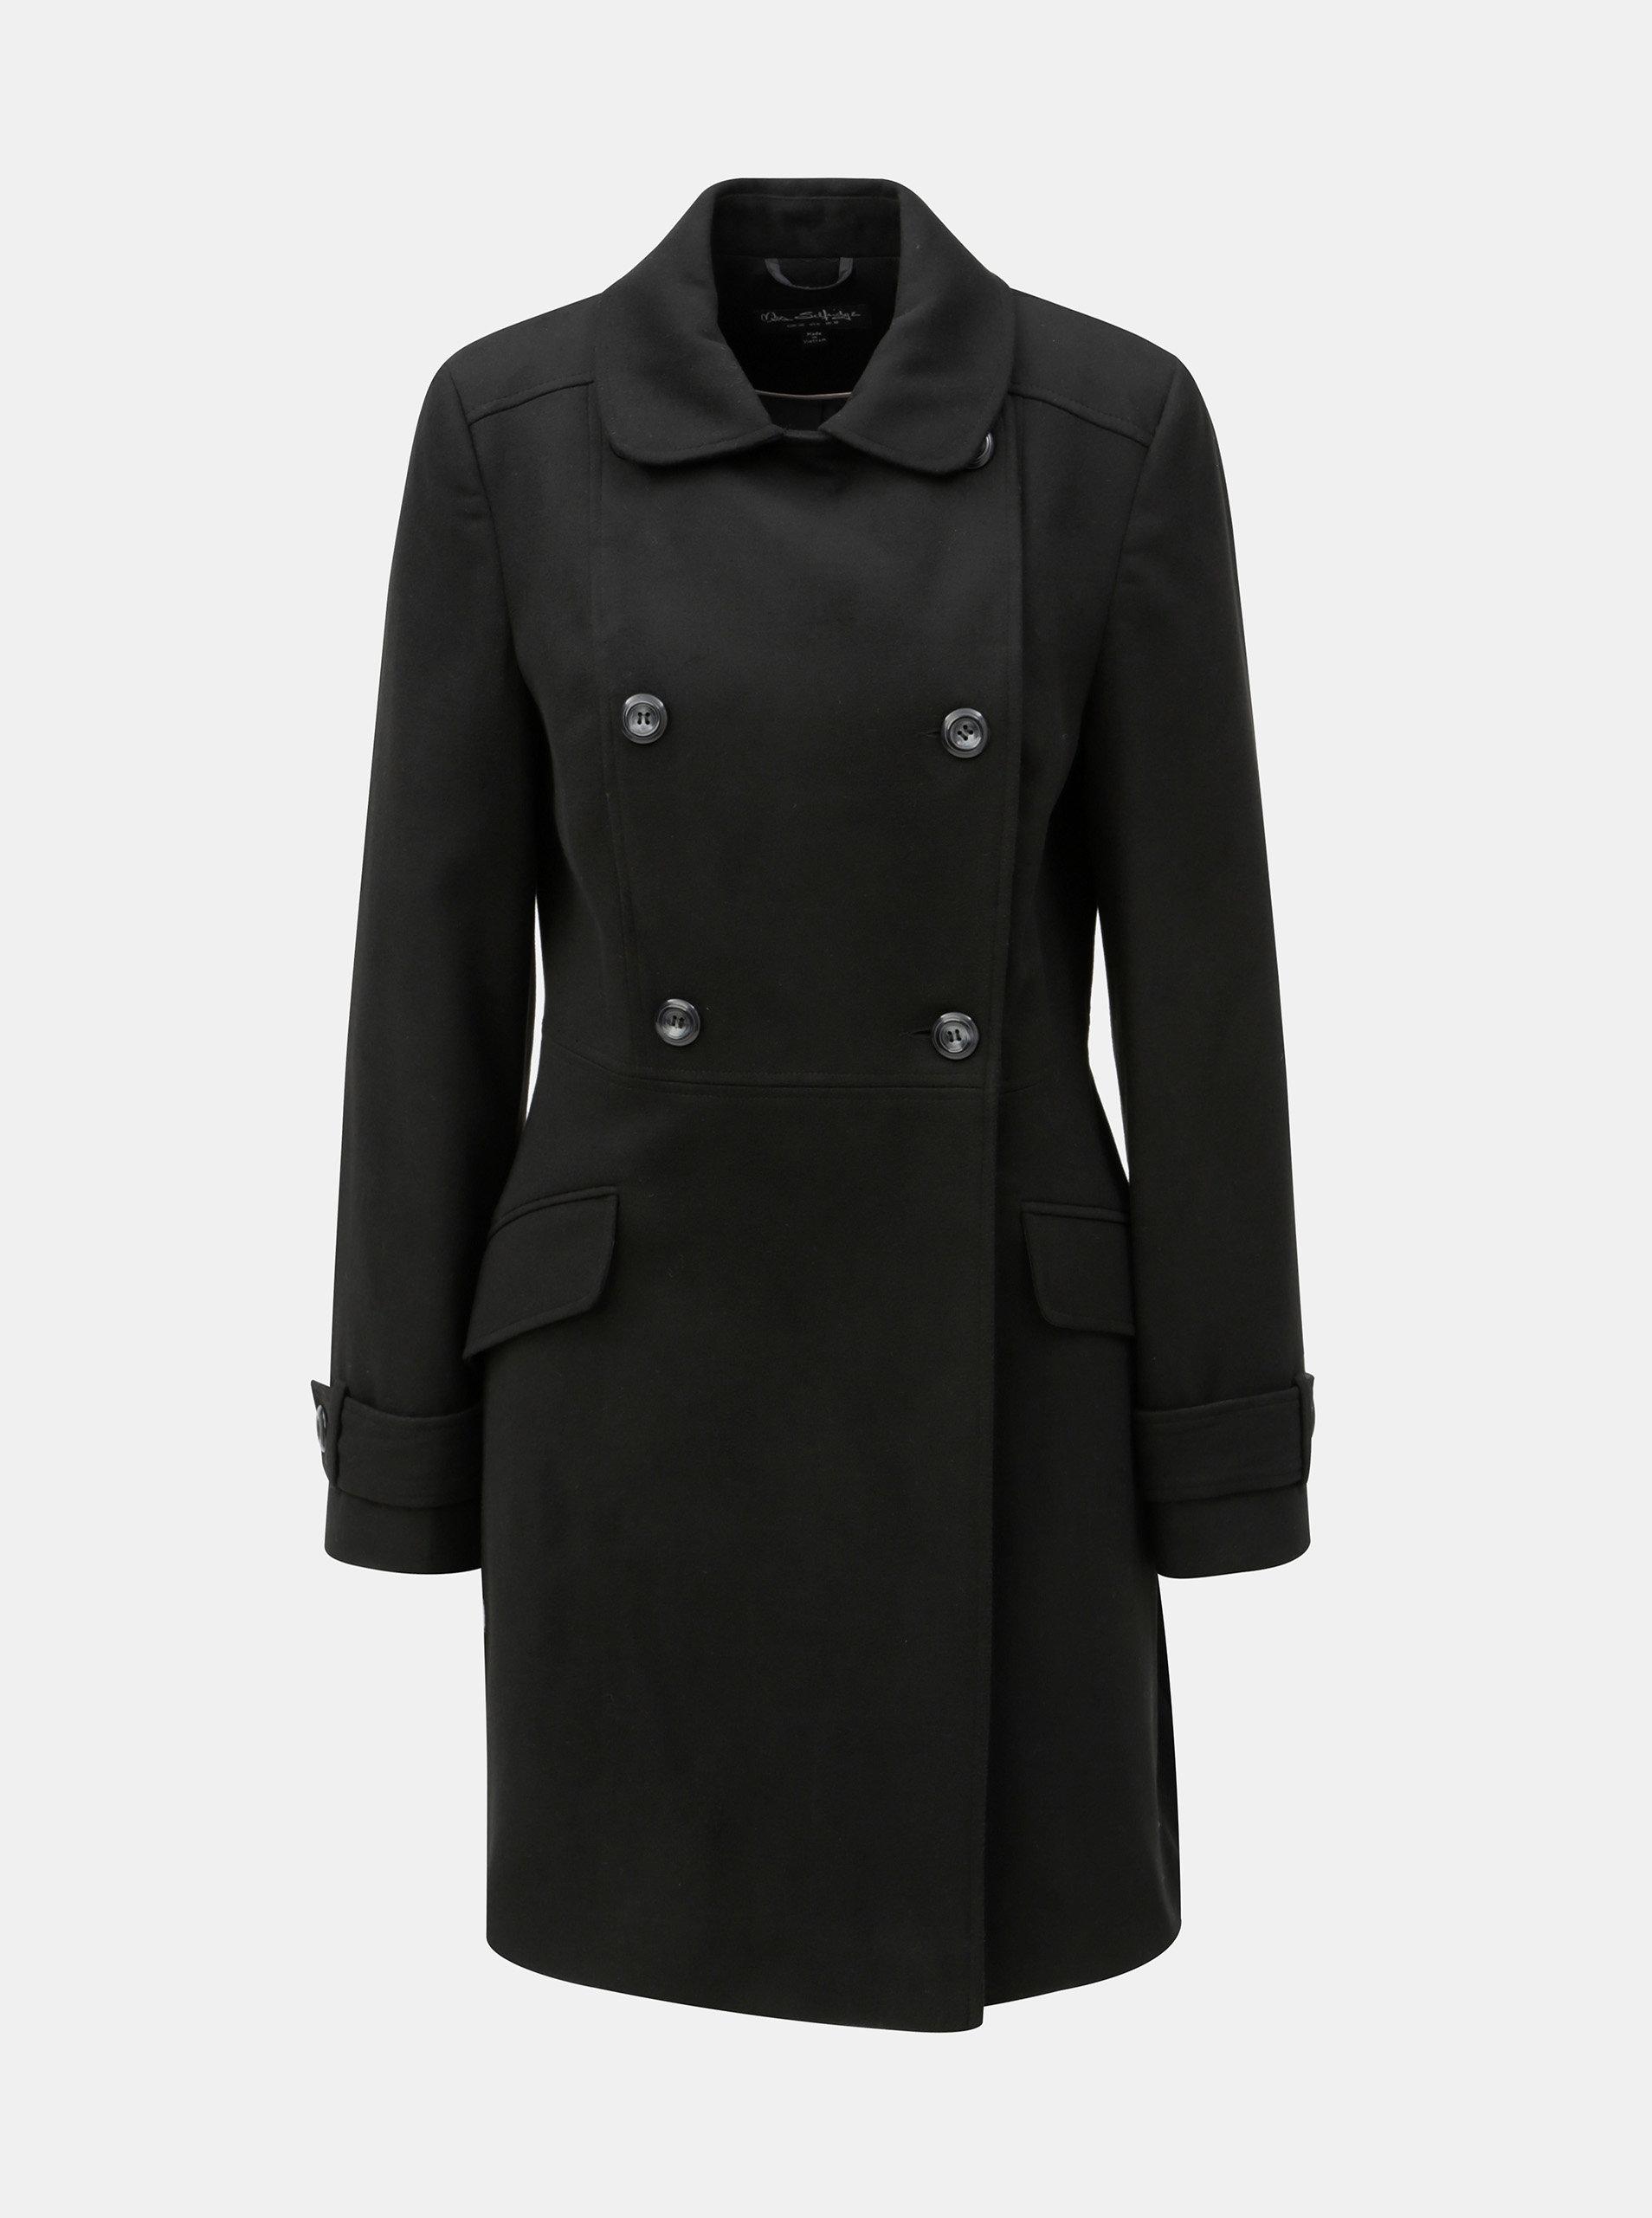 Černý kabát s knoflíky Miss Selfridge